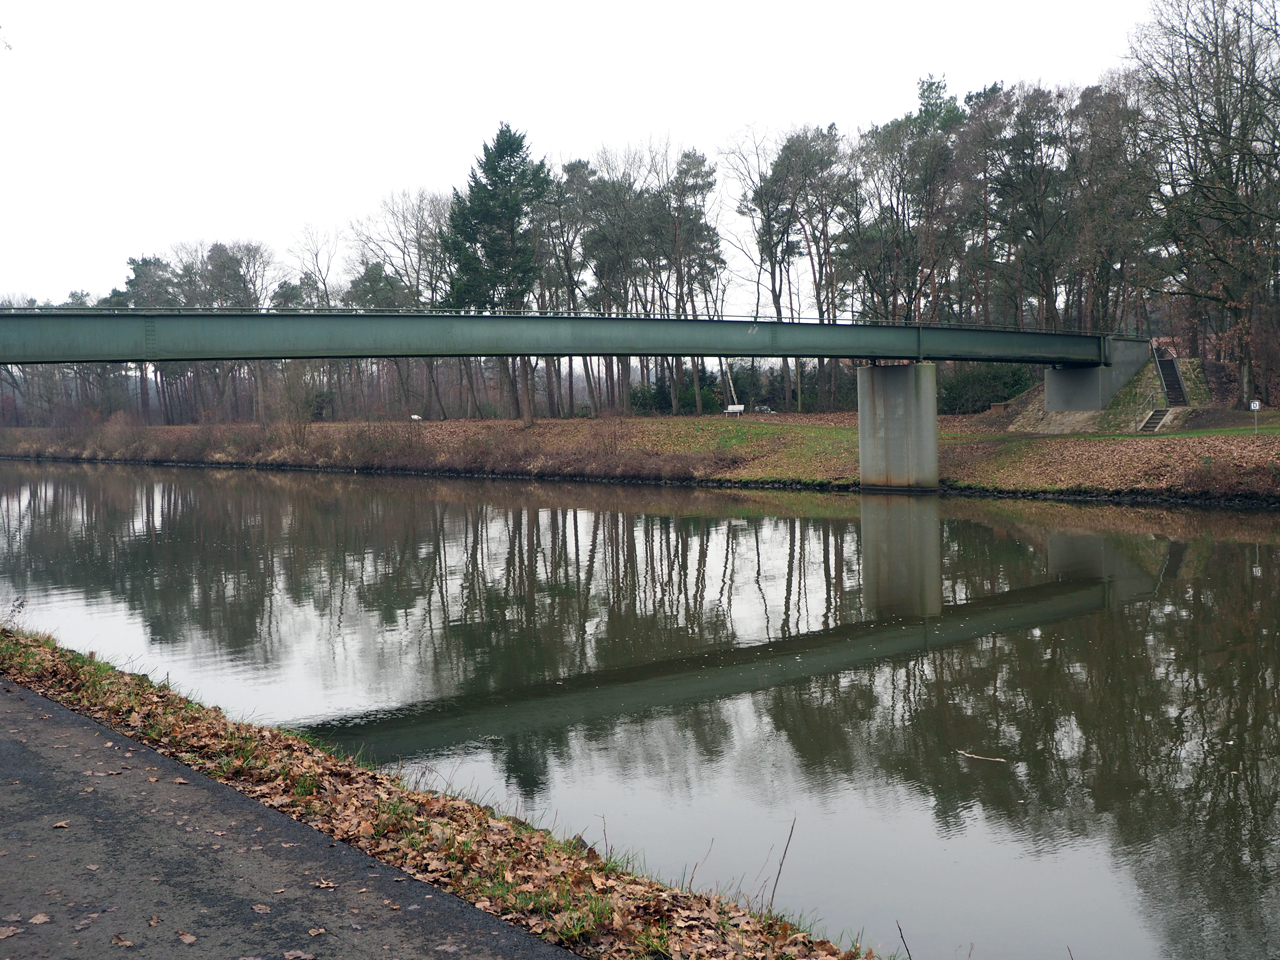 voetgangersbrug bij Holthausen